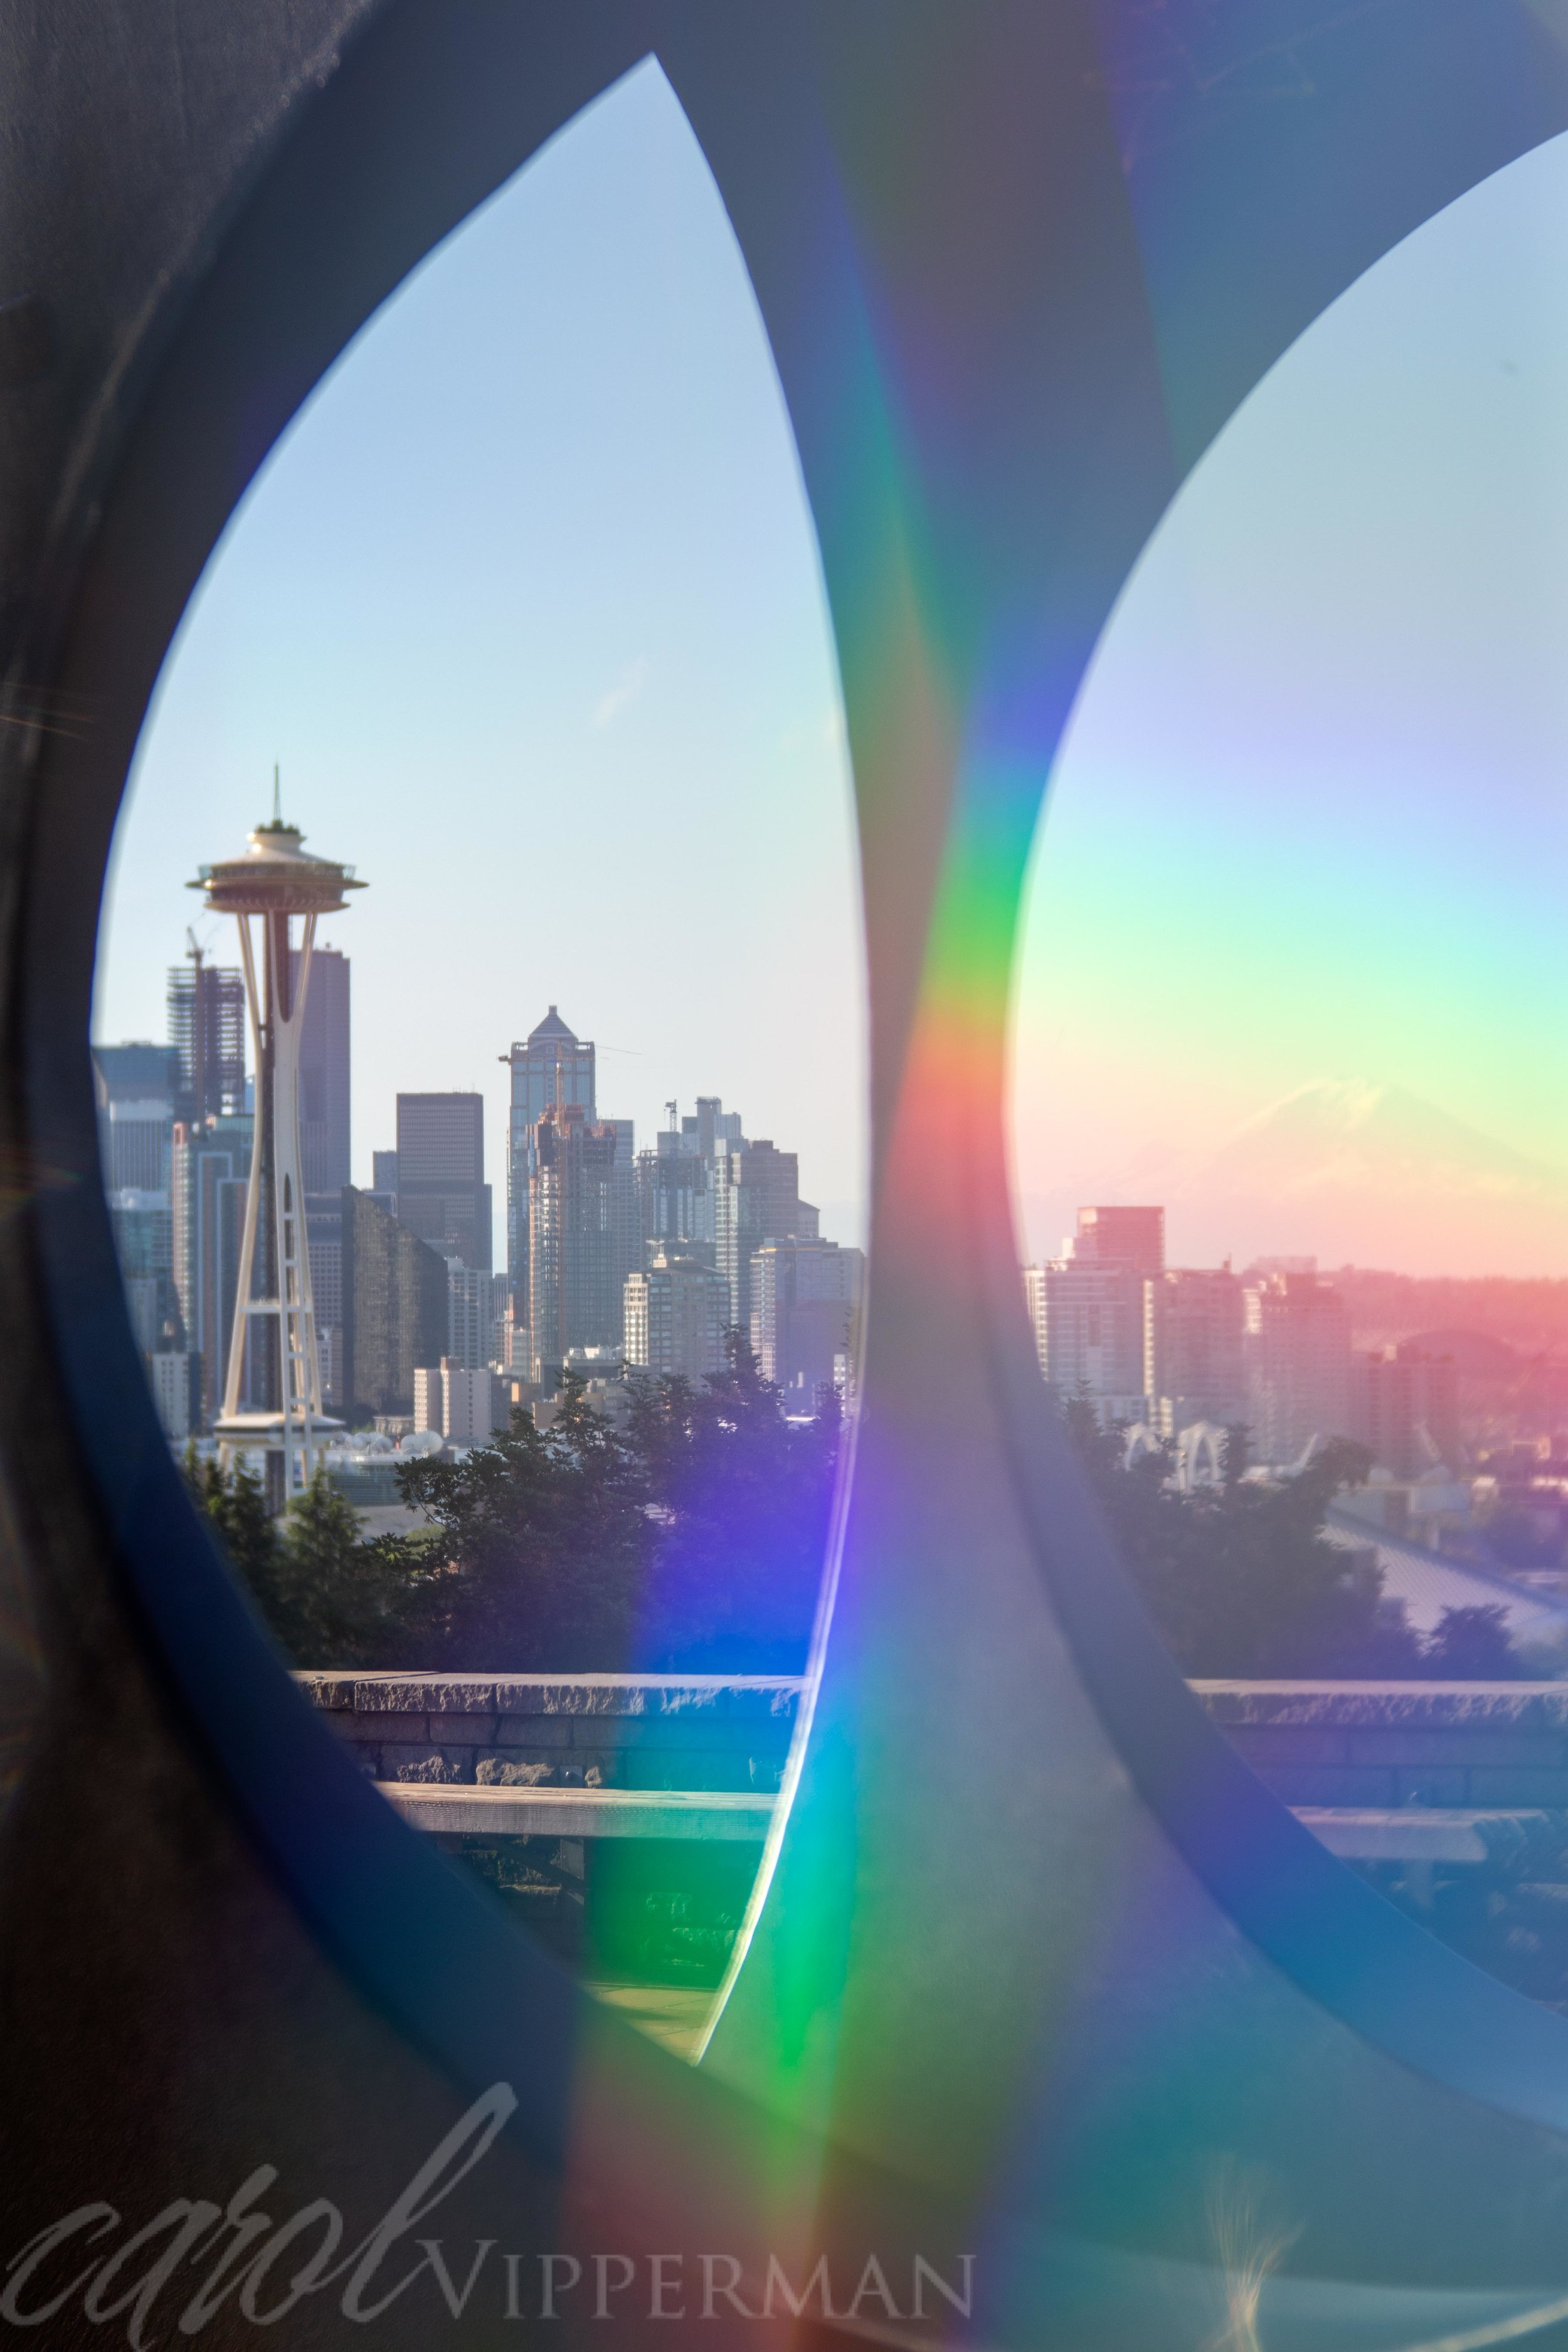 Rainbow film filter